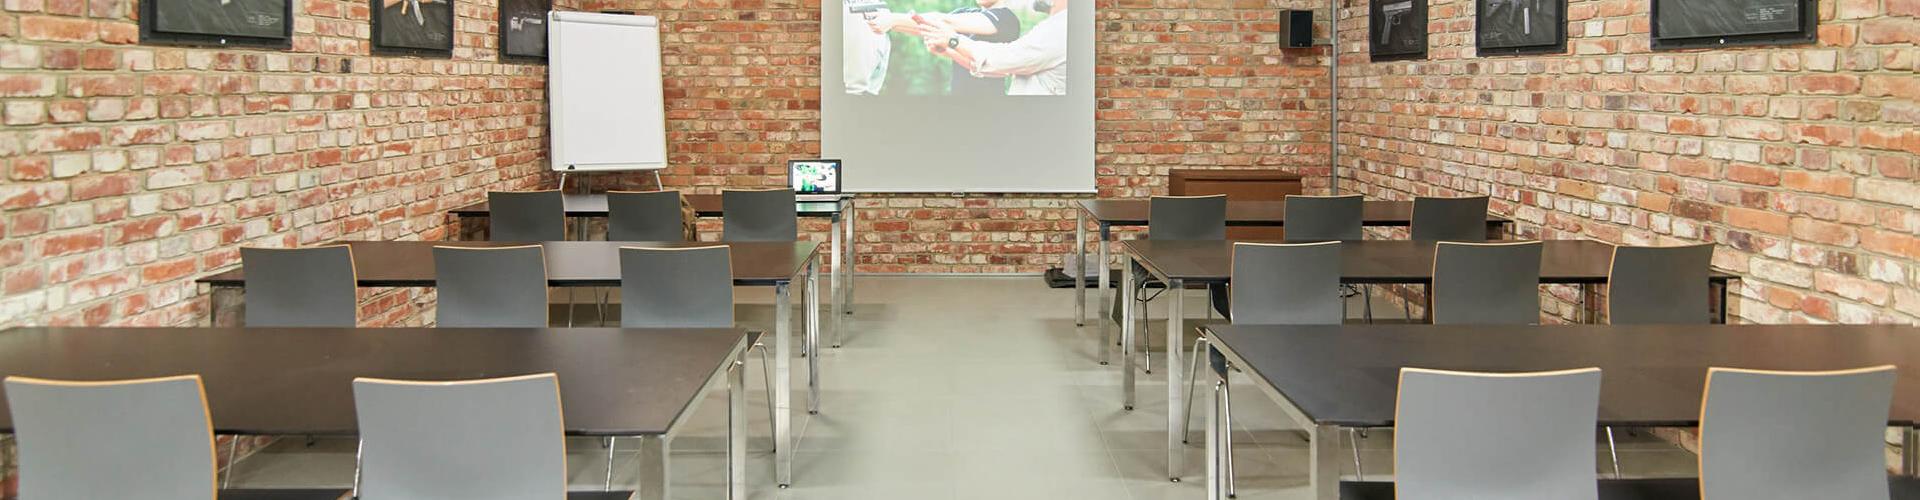 Acies International - Training & Courses